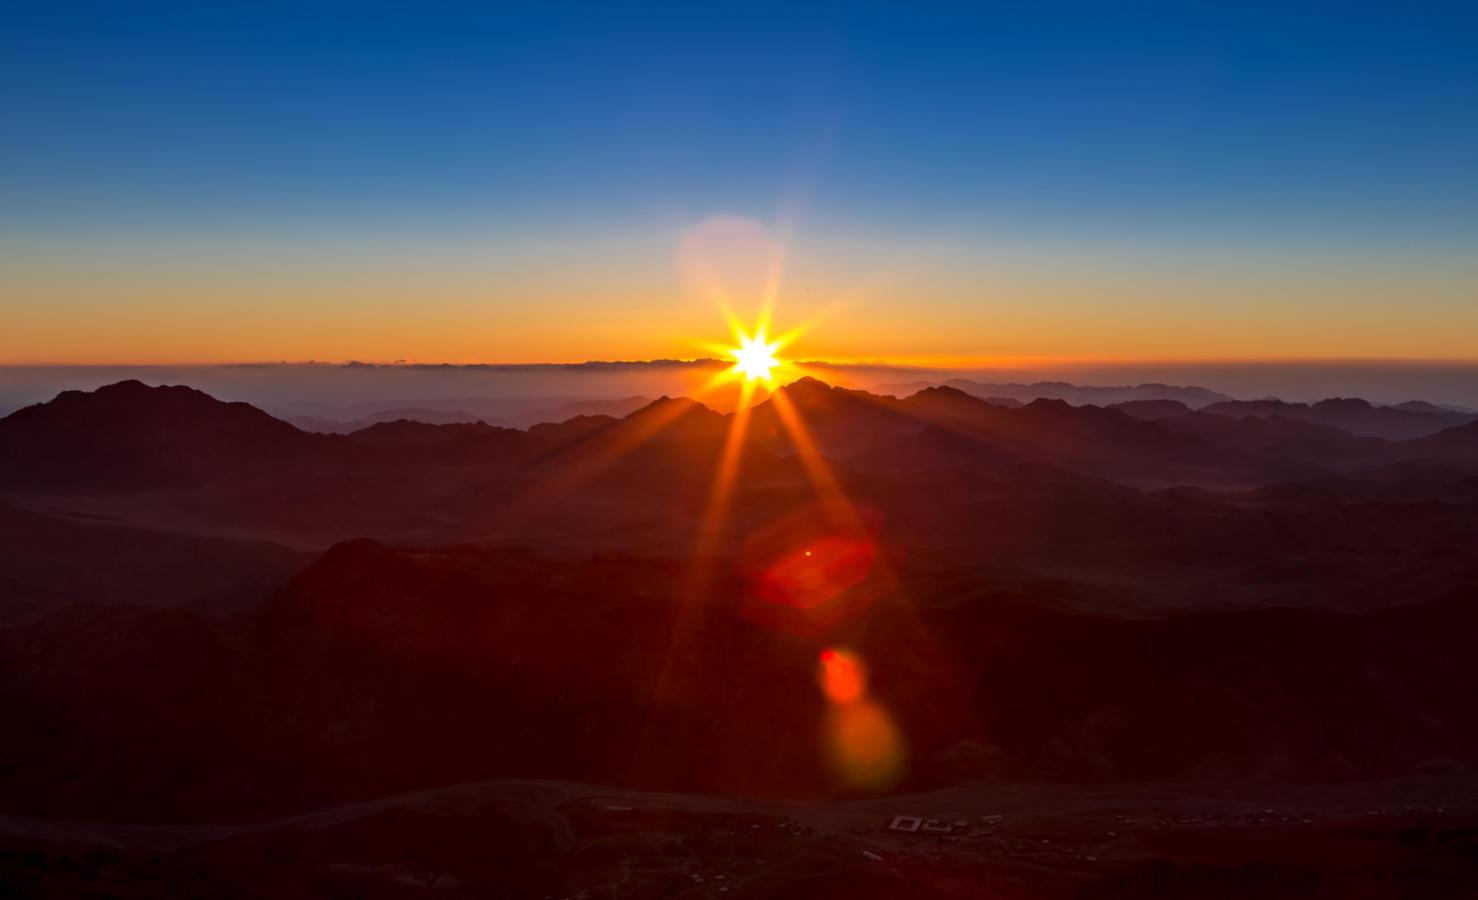 Mount Sinai, Mount Moses in Egypt. Africa.